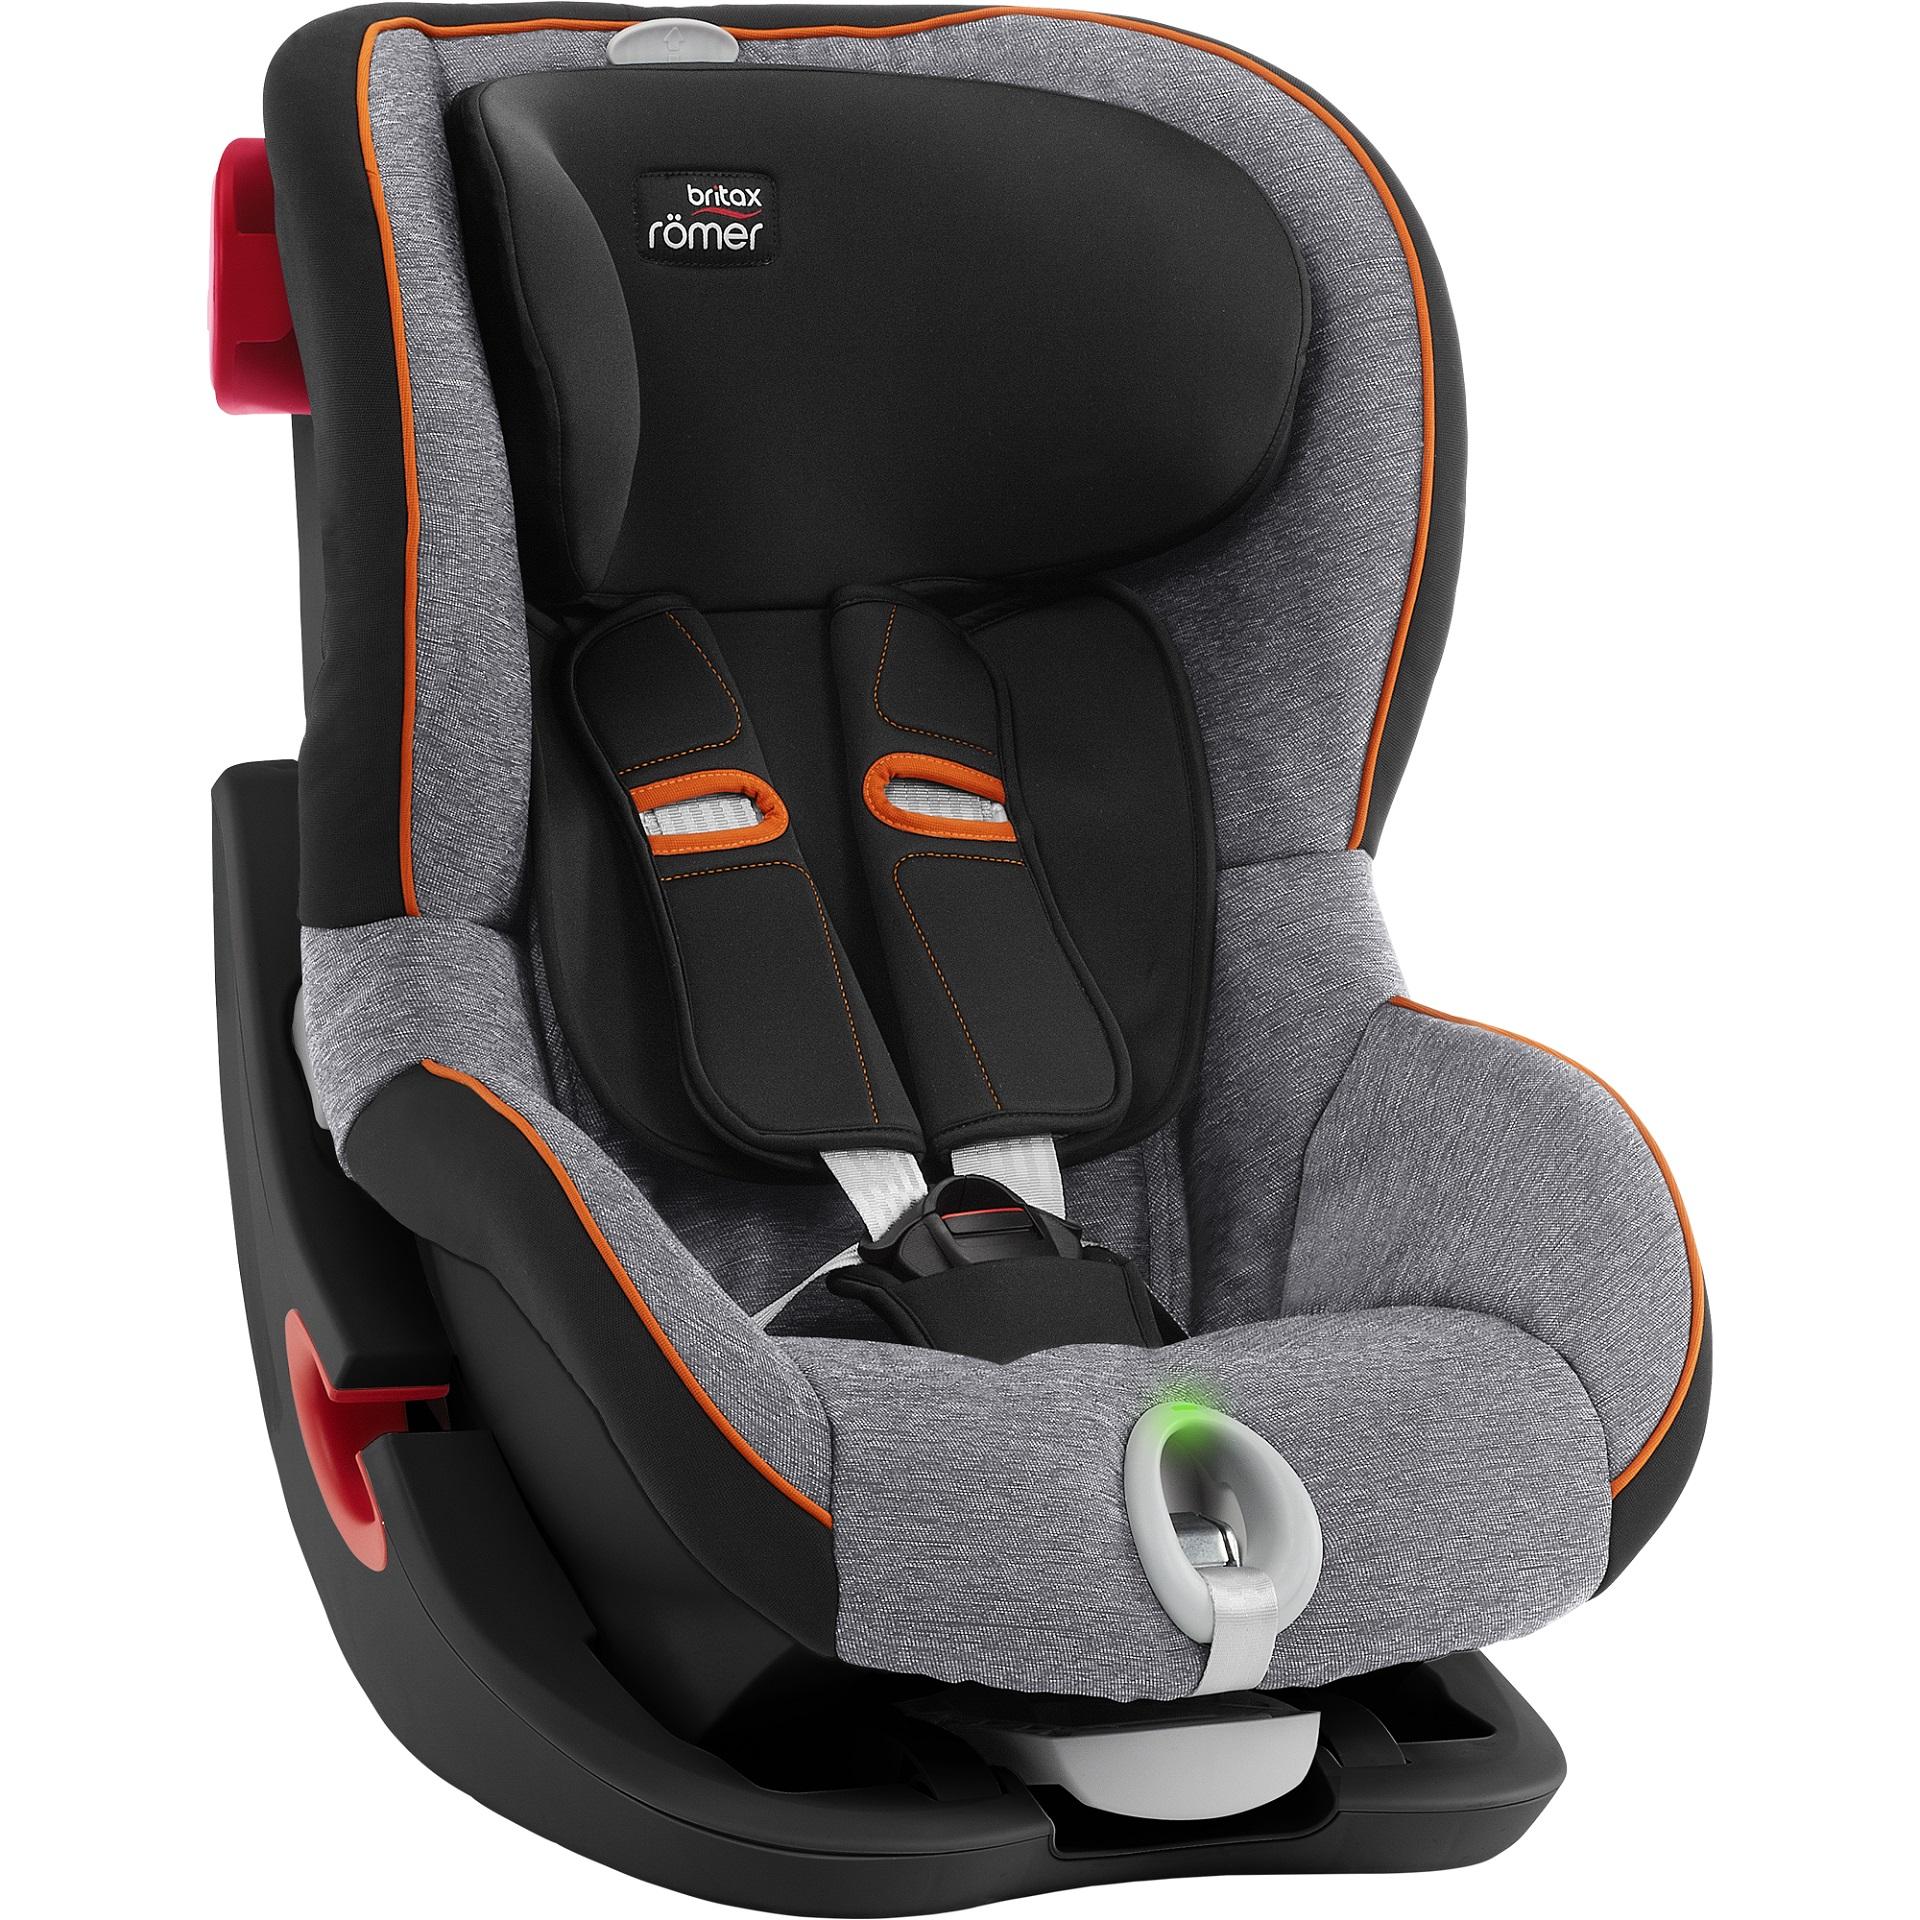 britax r mer car seat king ii ls black series 2018 black marble buy at kidsroom car seats. Black Bedroom Furniture Sets. Home Design Ideas